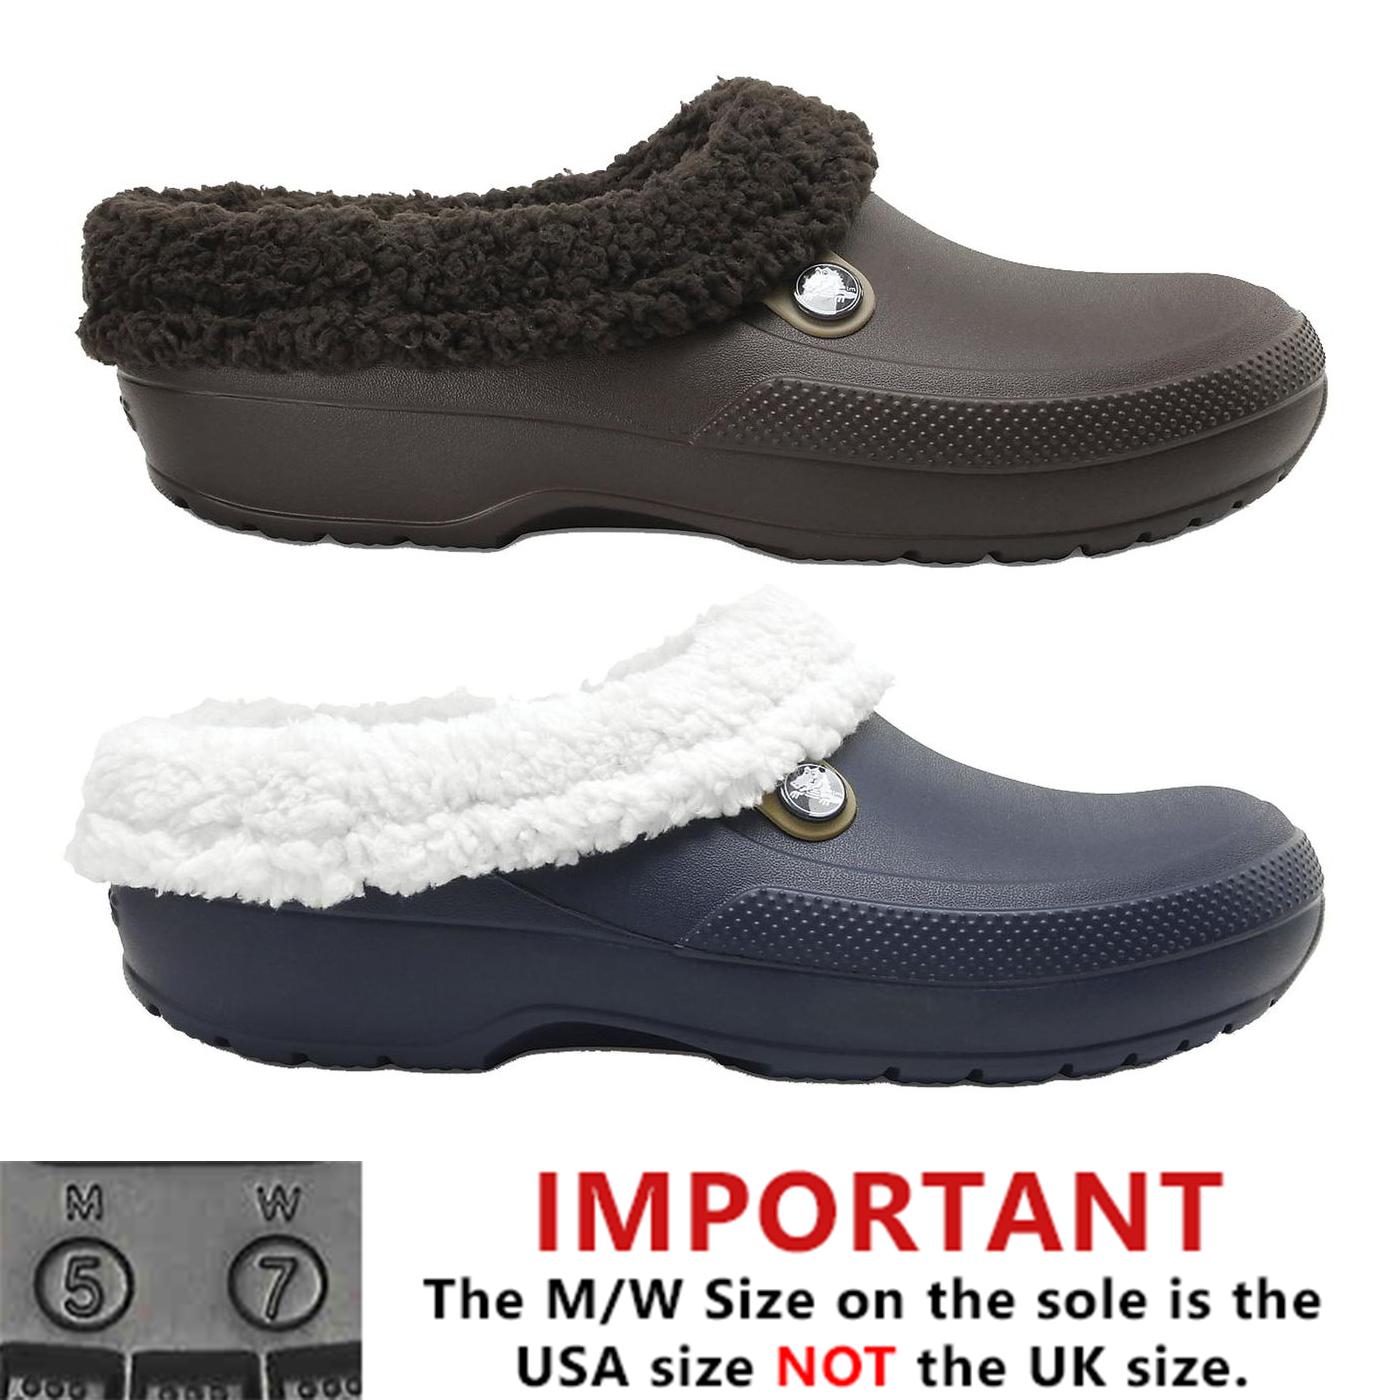 5d2c01e8fae0 Crocs Slippers Blitzen Mens Womens Ladies Lined Vegan Clogs Shoes ...